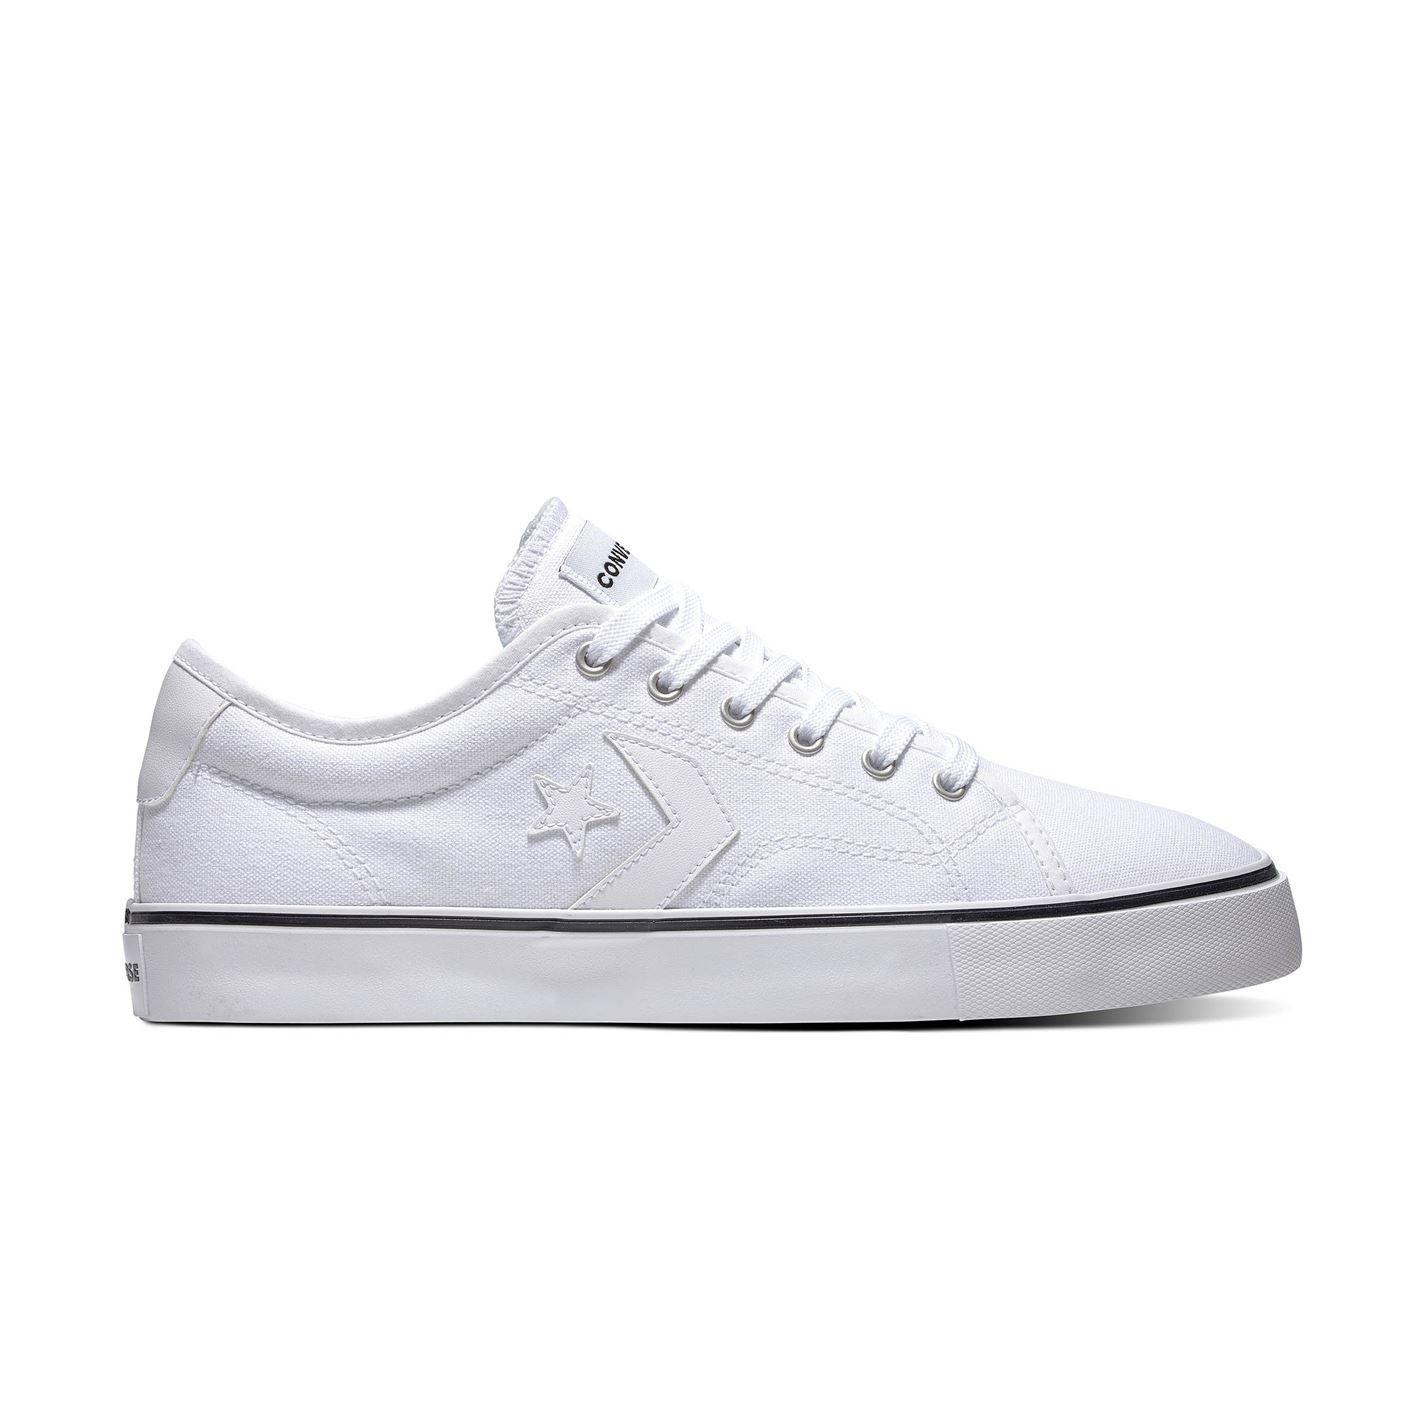 Converse-Ox-REPLAY-Baskets-Pour-Homme-Chaussures-De-Loisirs-Chaussures-Baskets miniature 26